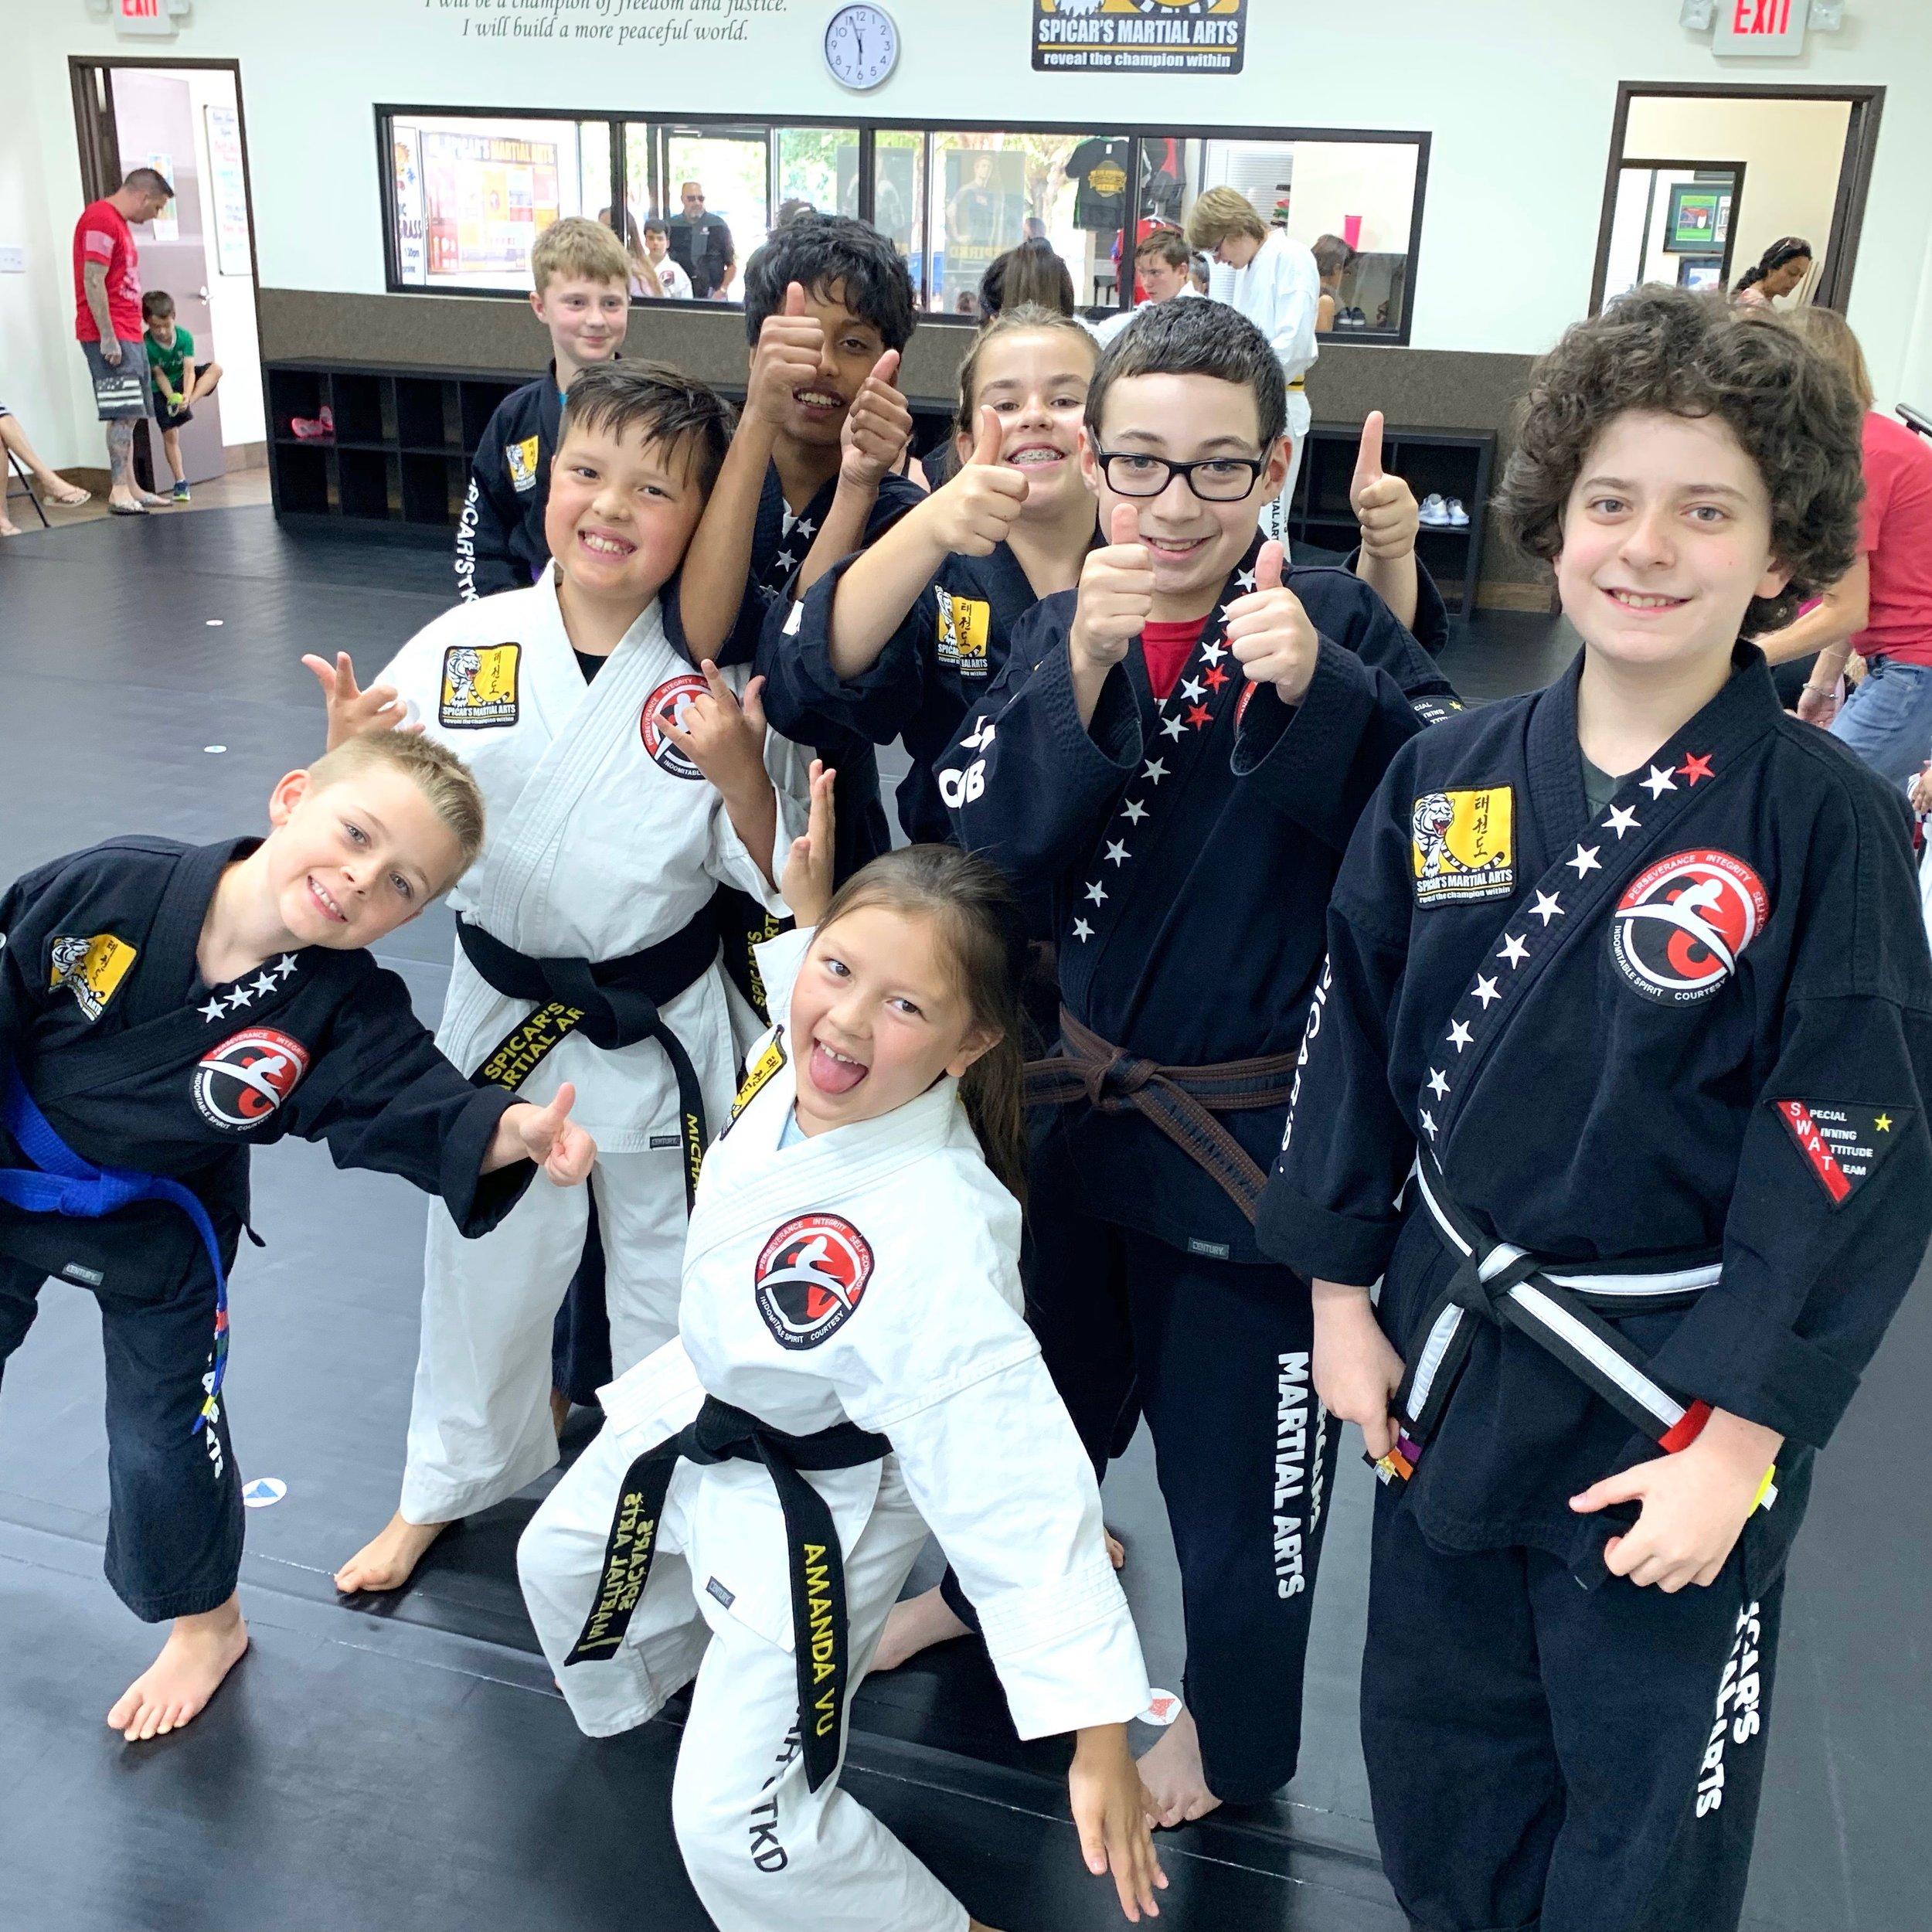 karate-kids-program-souhtlake-keller-grapevine-texas00002.jpeg